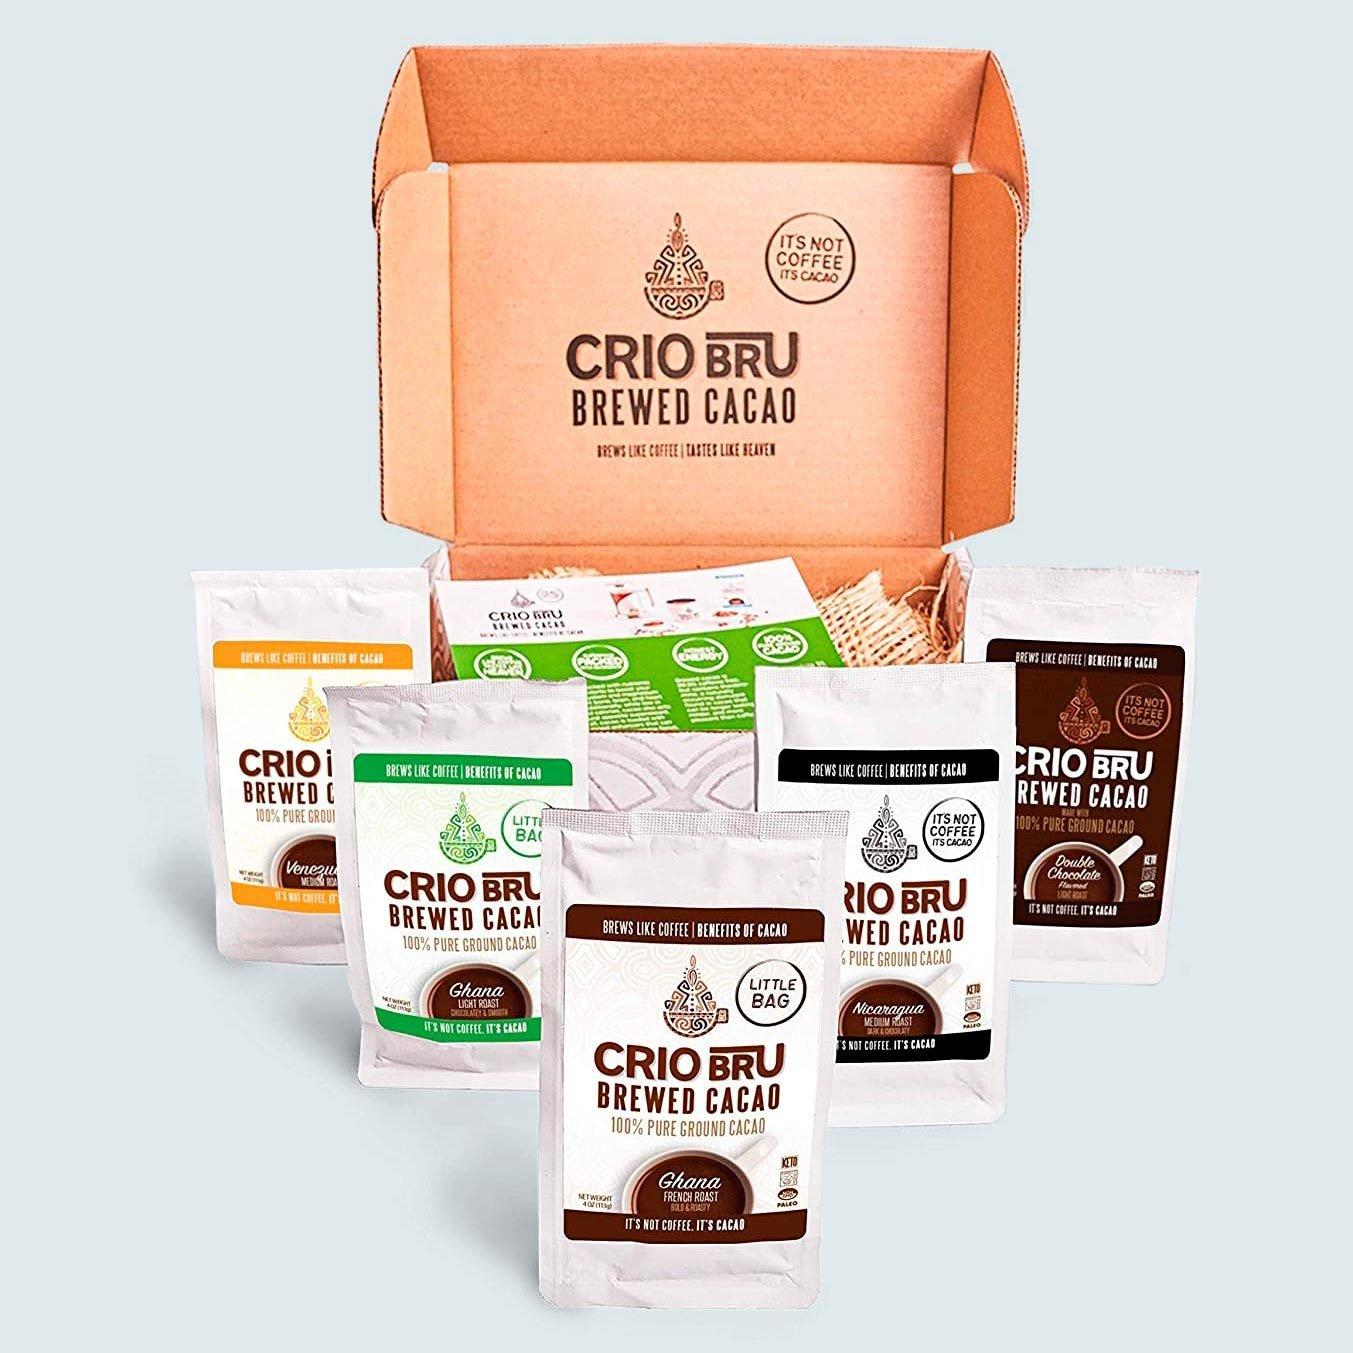 Crio Bru Brewed Cacao Starter Pack